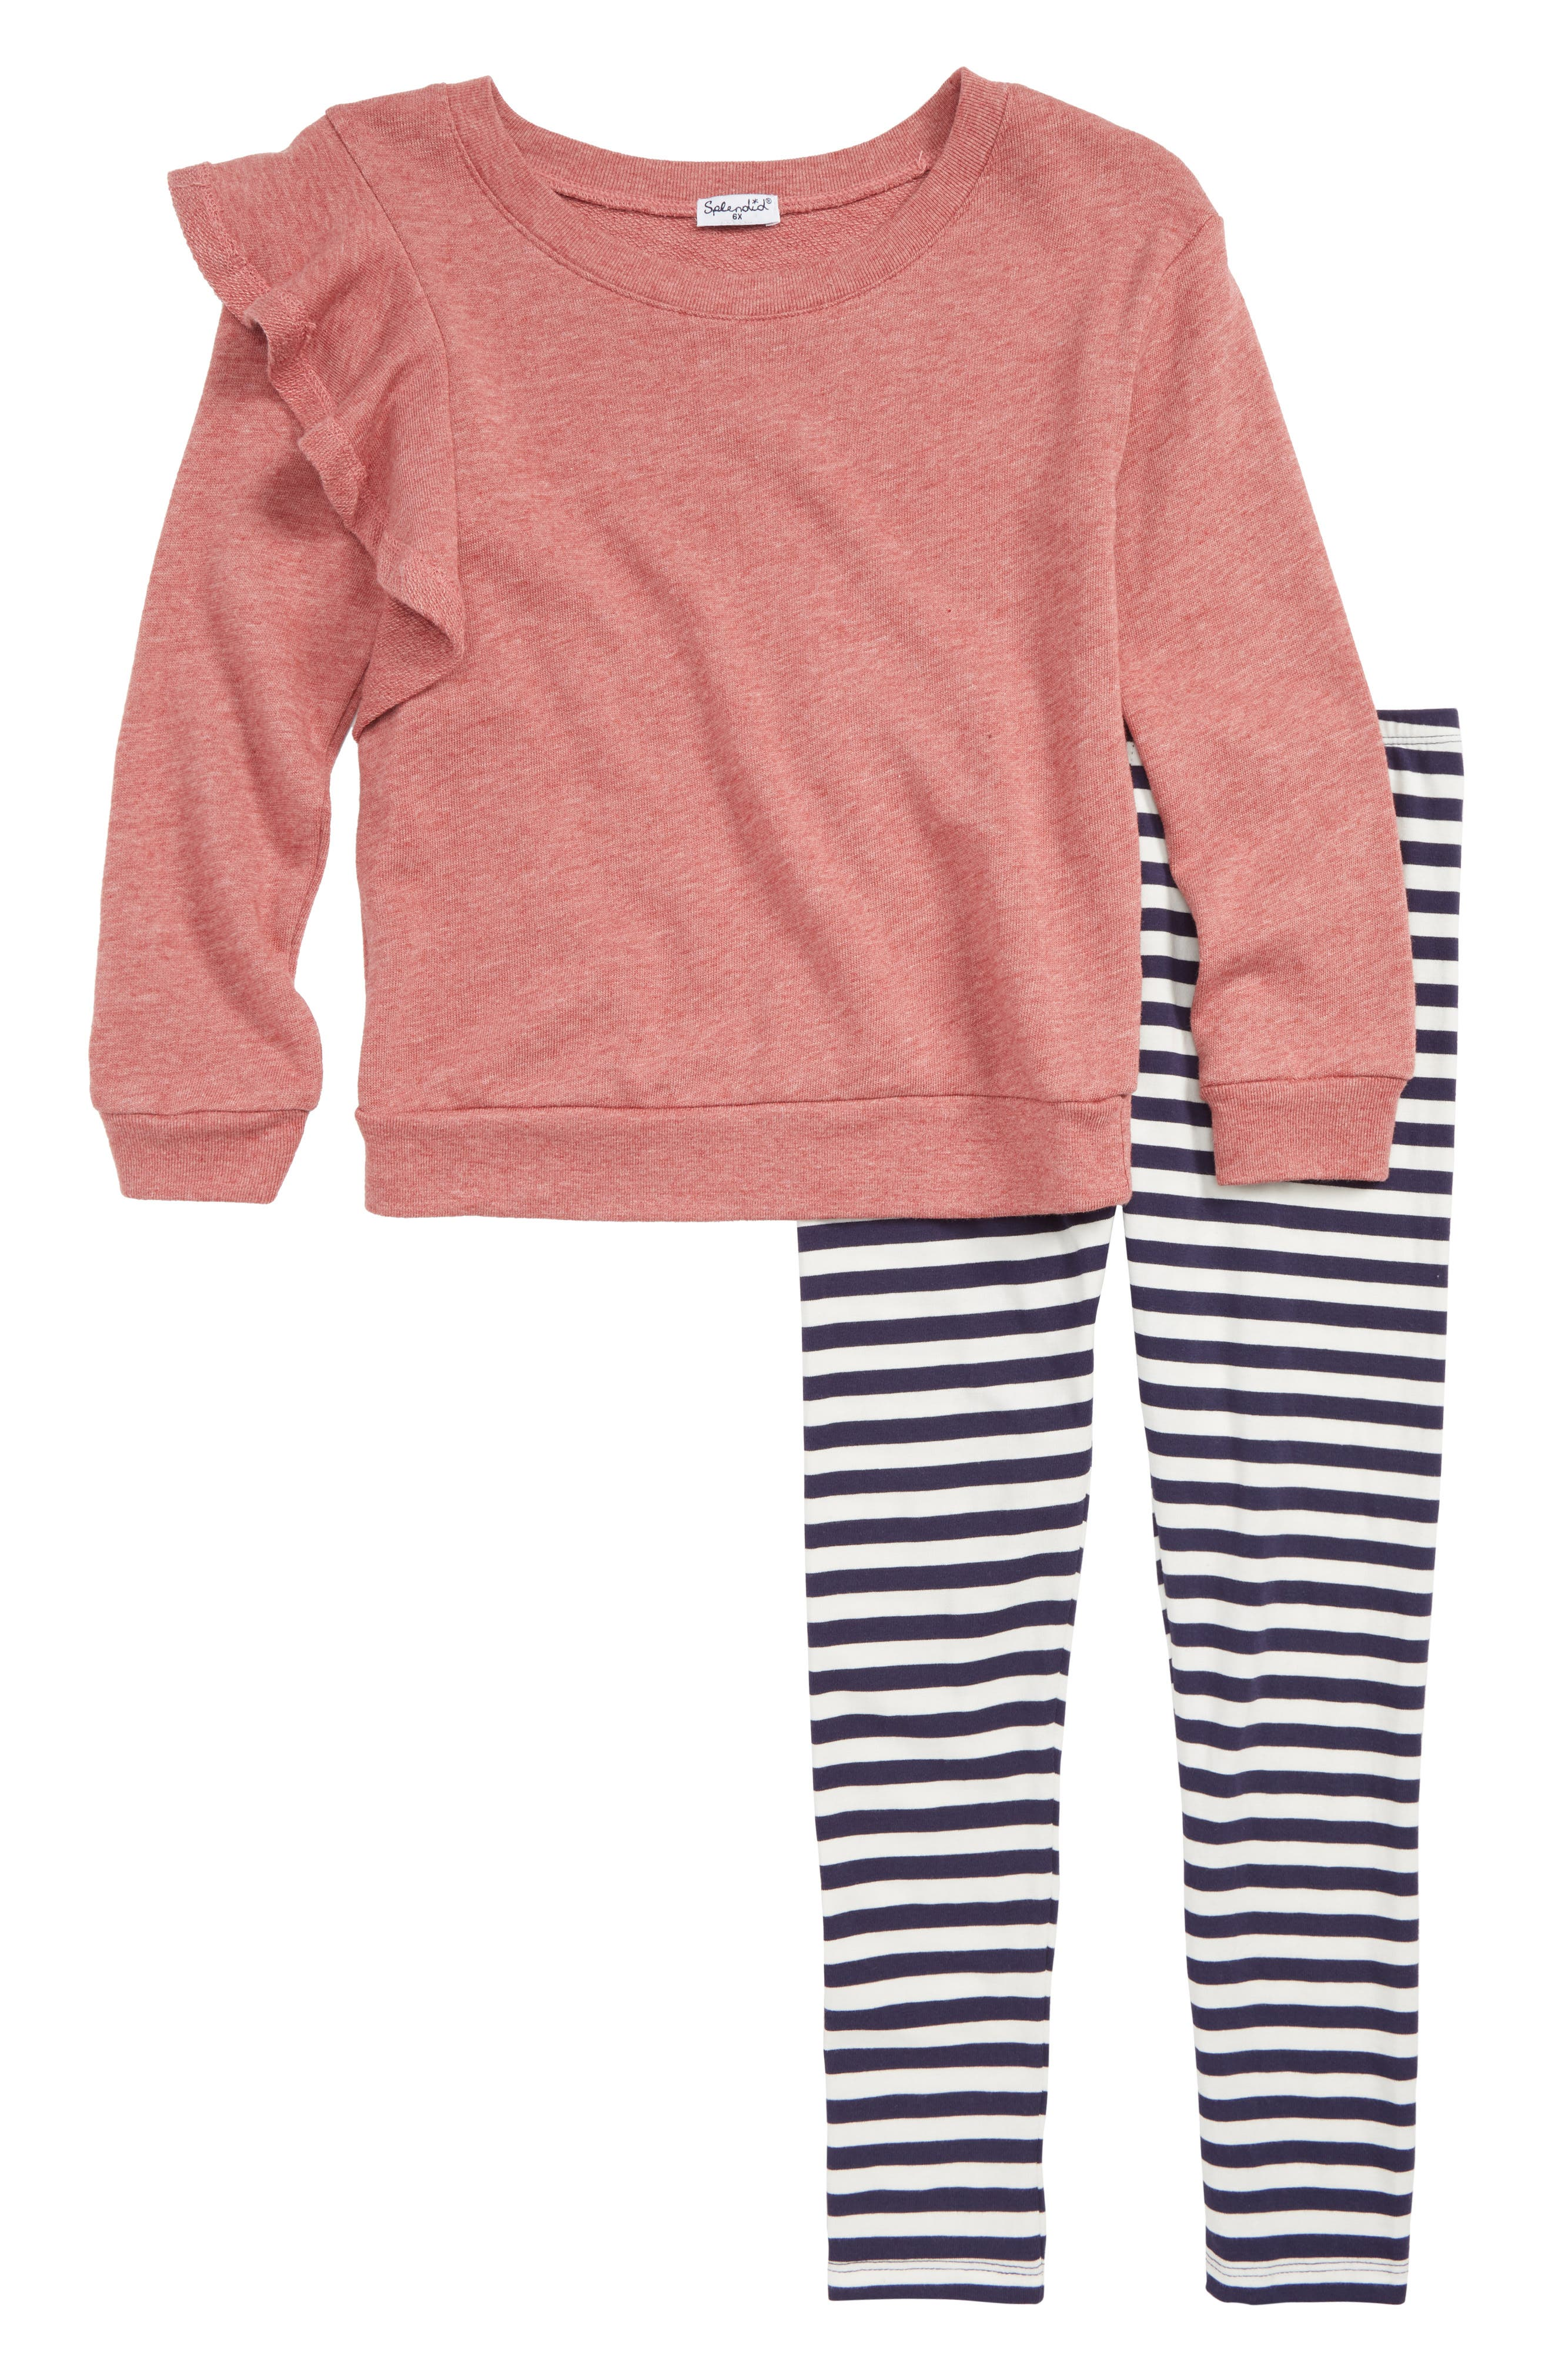 Ruffle Sweatshirt & Leggings Set,                         Main,                         color, WINTER ROSE